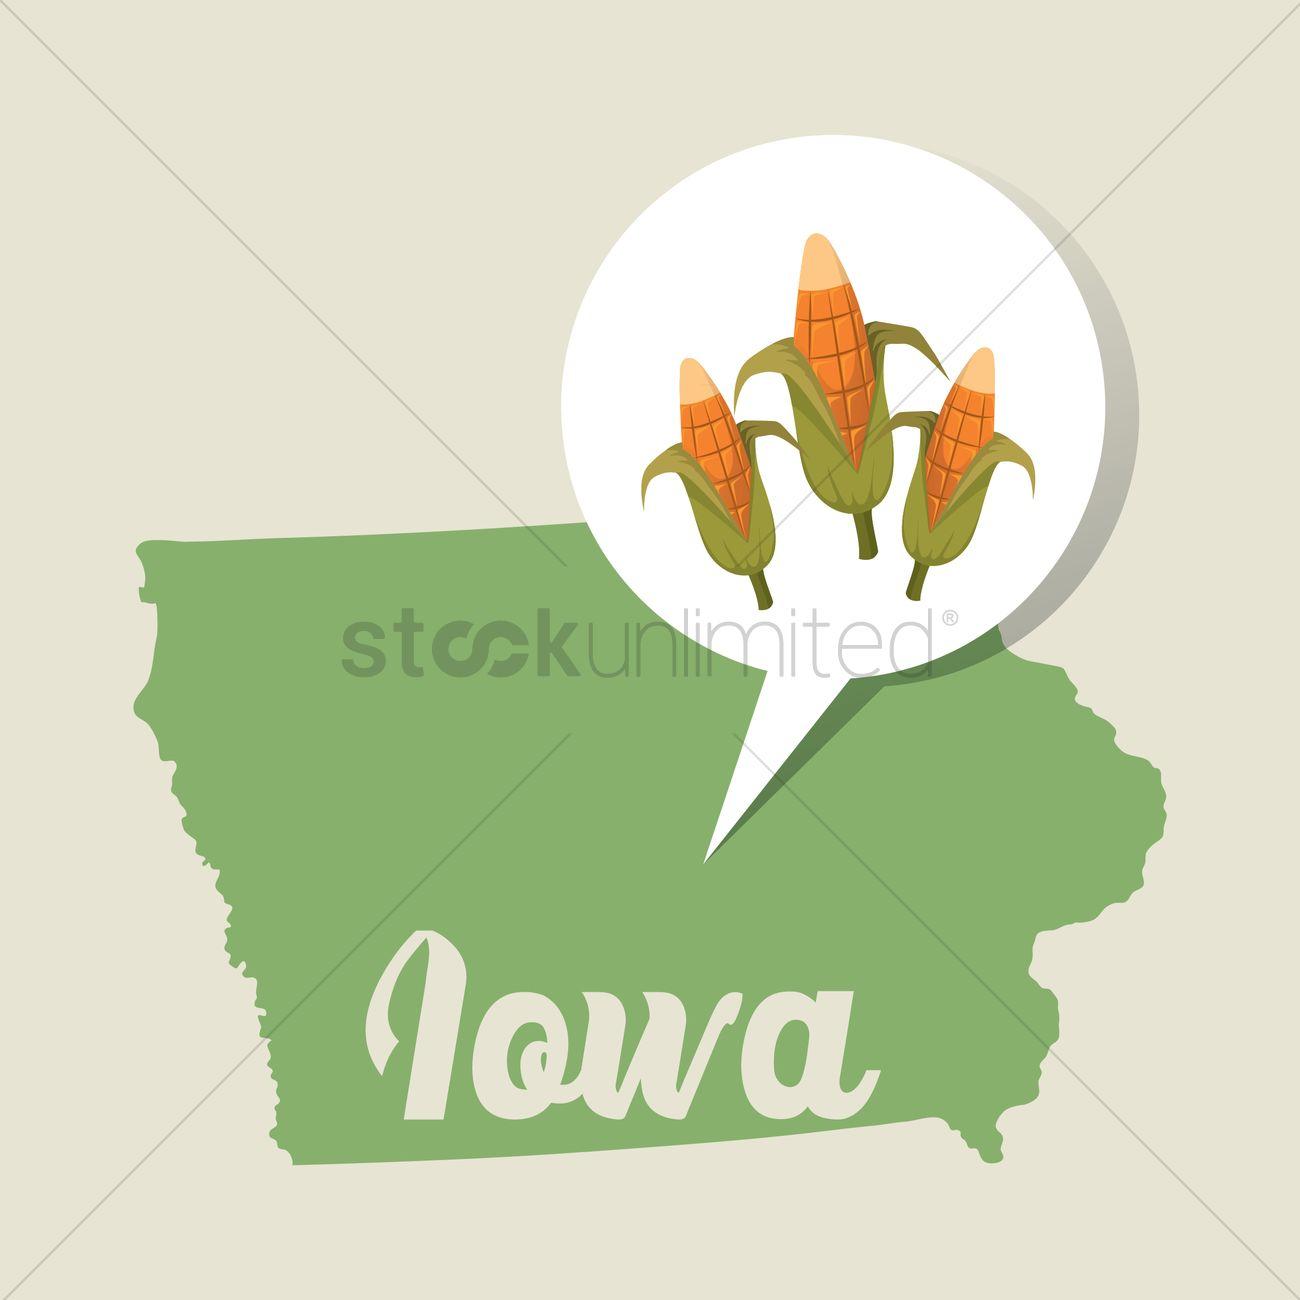 Iowa Map With Corn Field Icon Vector Graphic